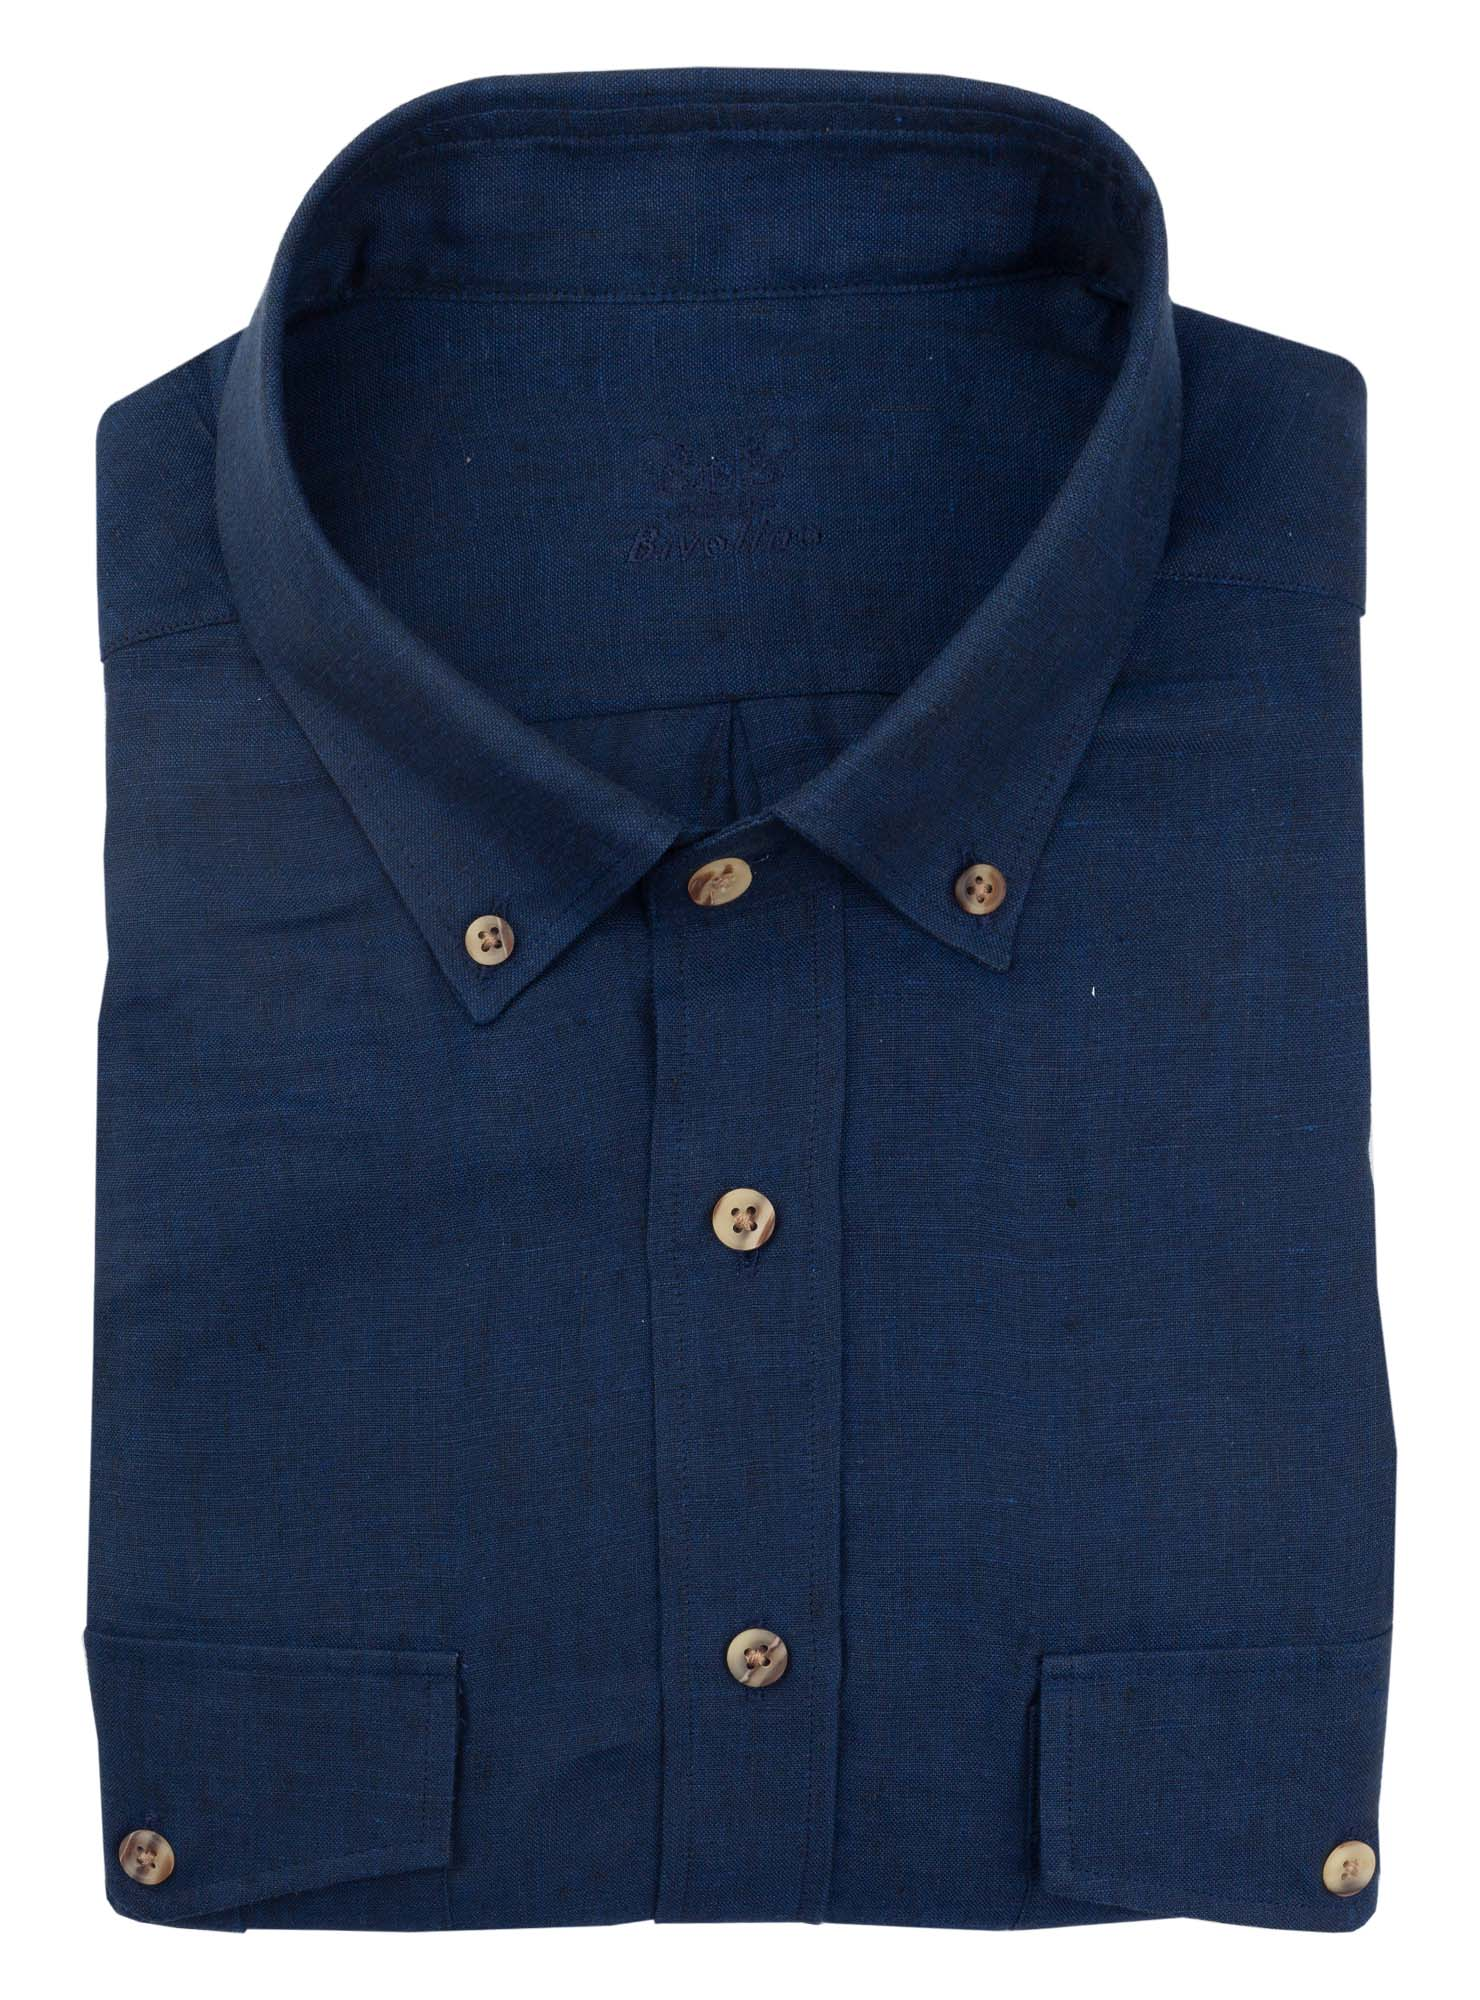 SERINI - chemise smart casual lin navy - Sera 3